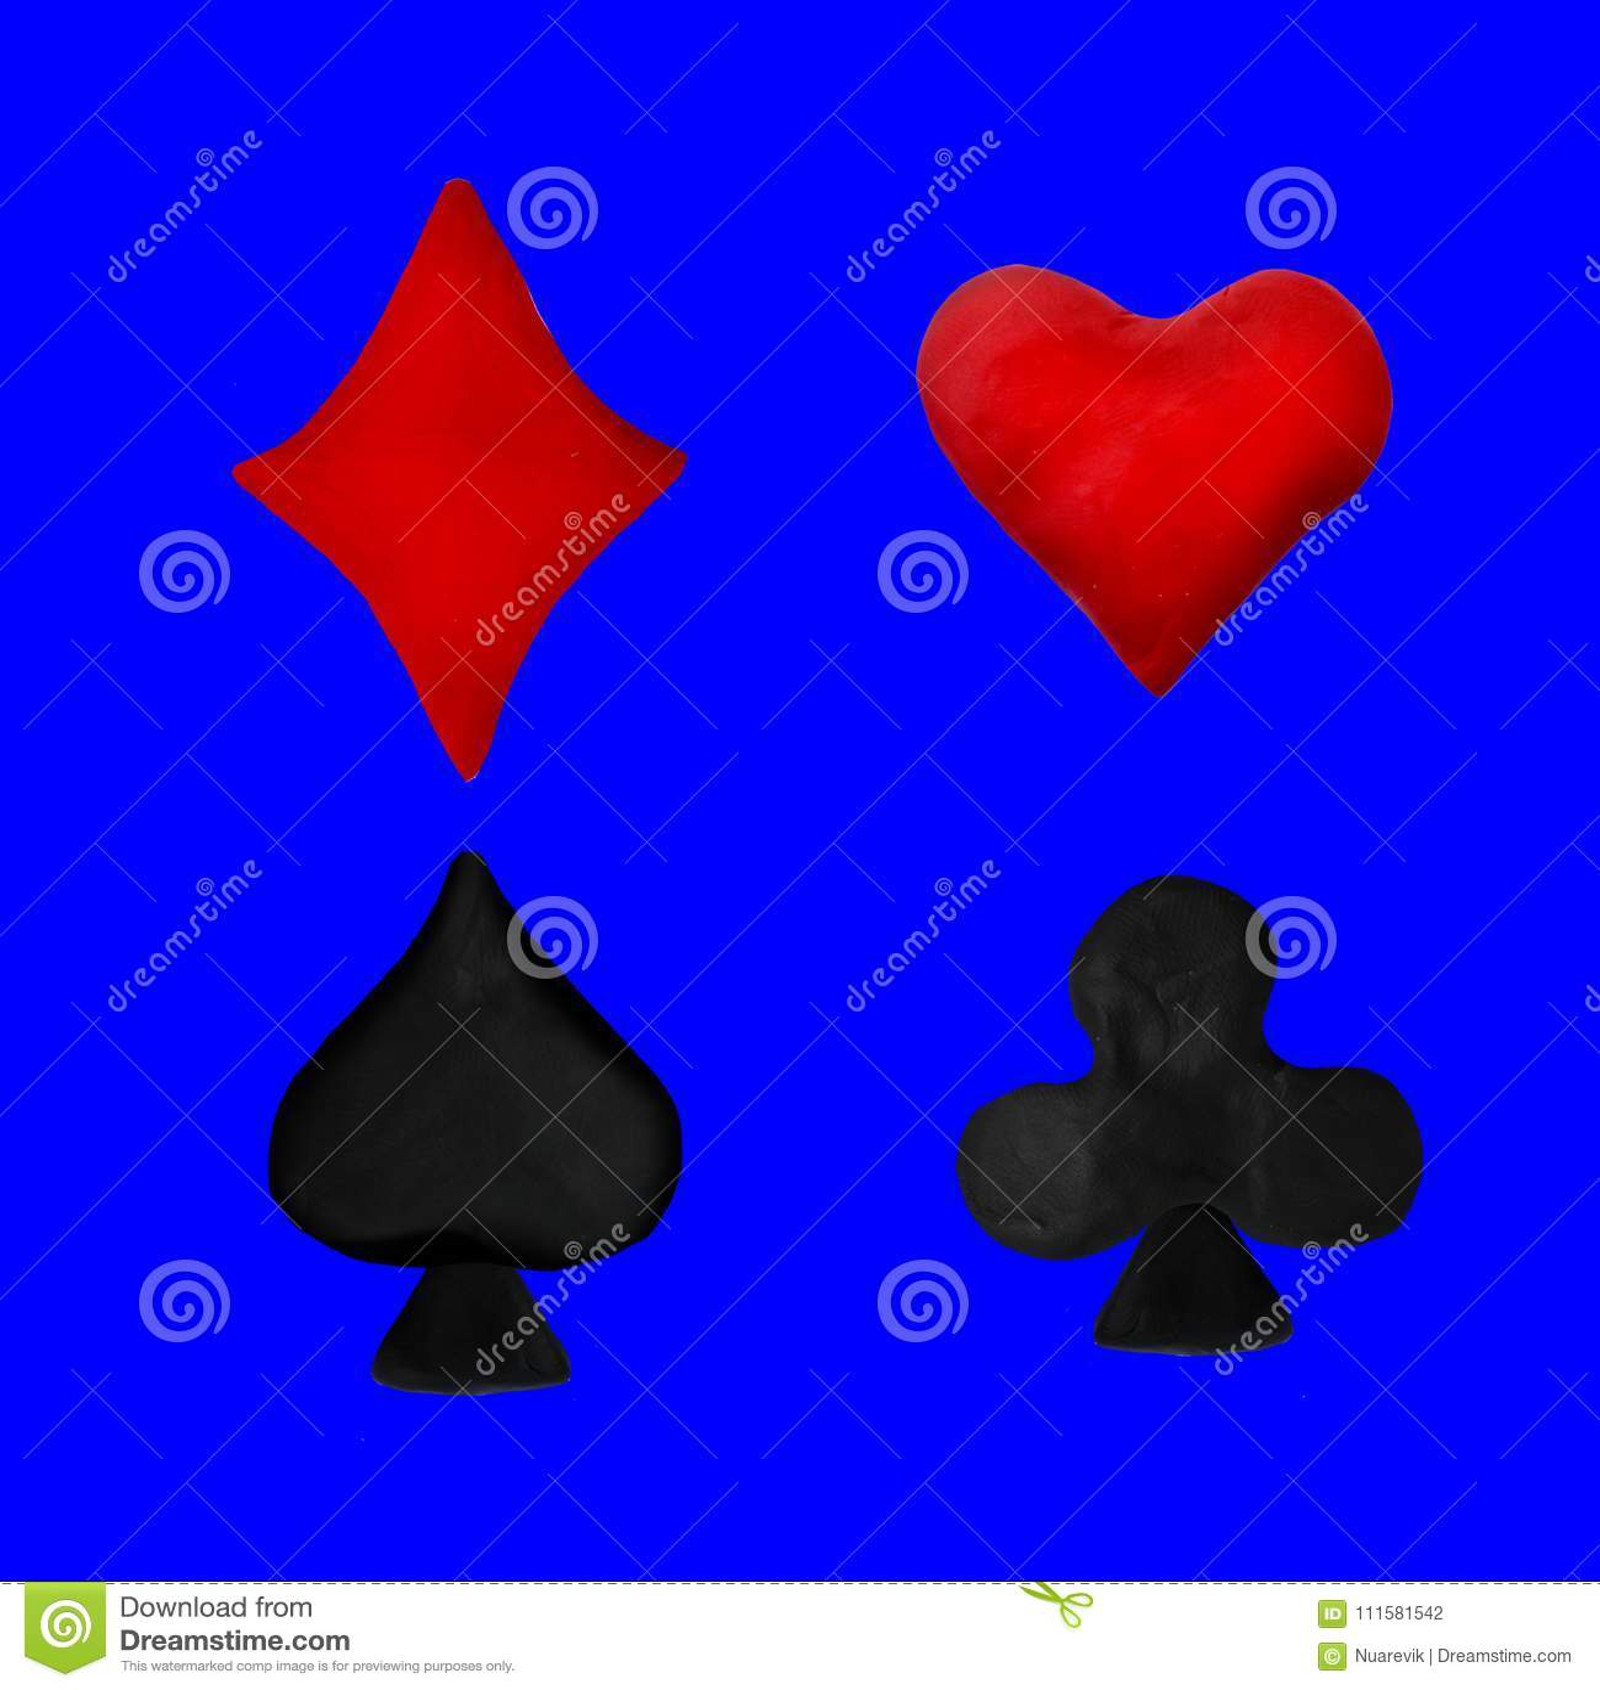 Plasticine Card Deck Symbols Cartoon Sculpture 3d Rendering Isolated